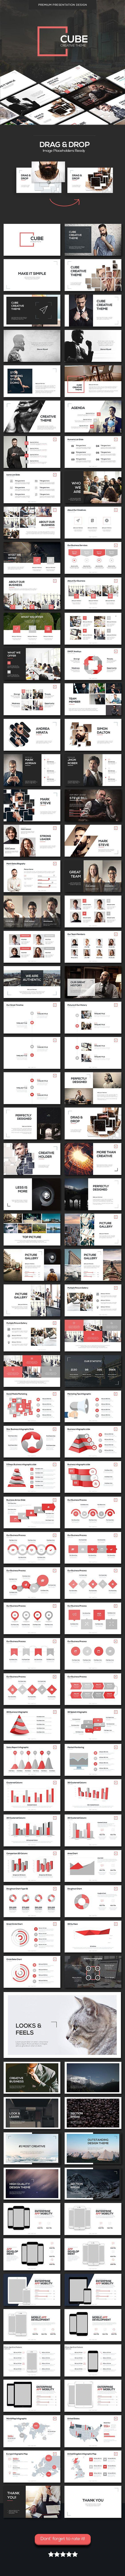 Indezine Free Powerpoint Templates Gallery - Templates Example Free ...